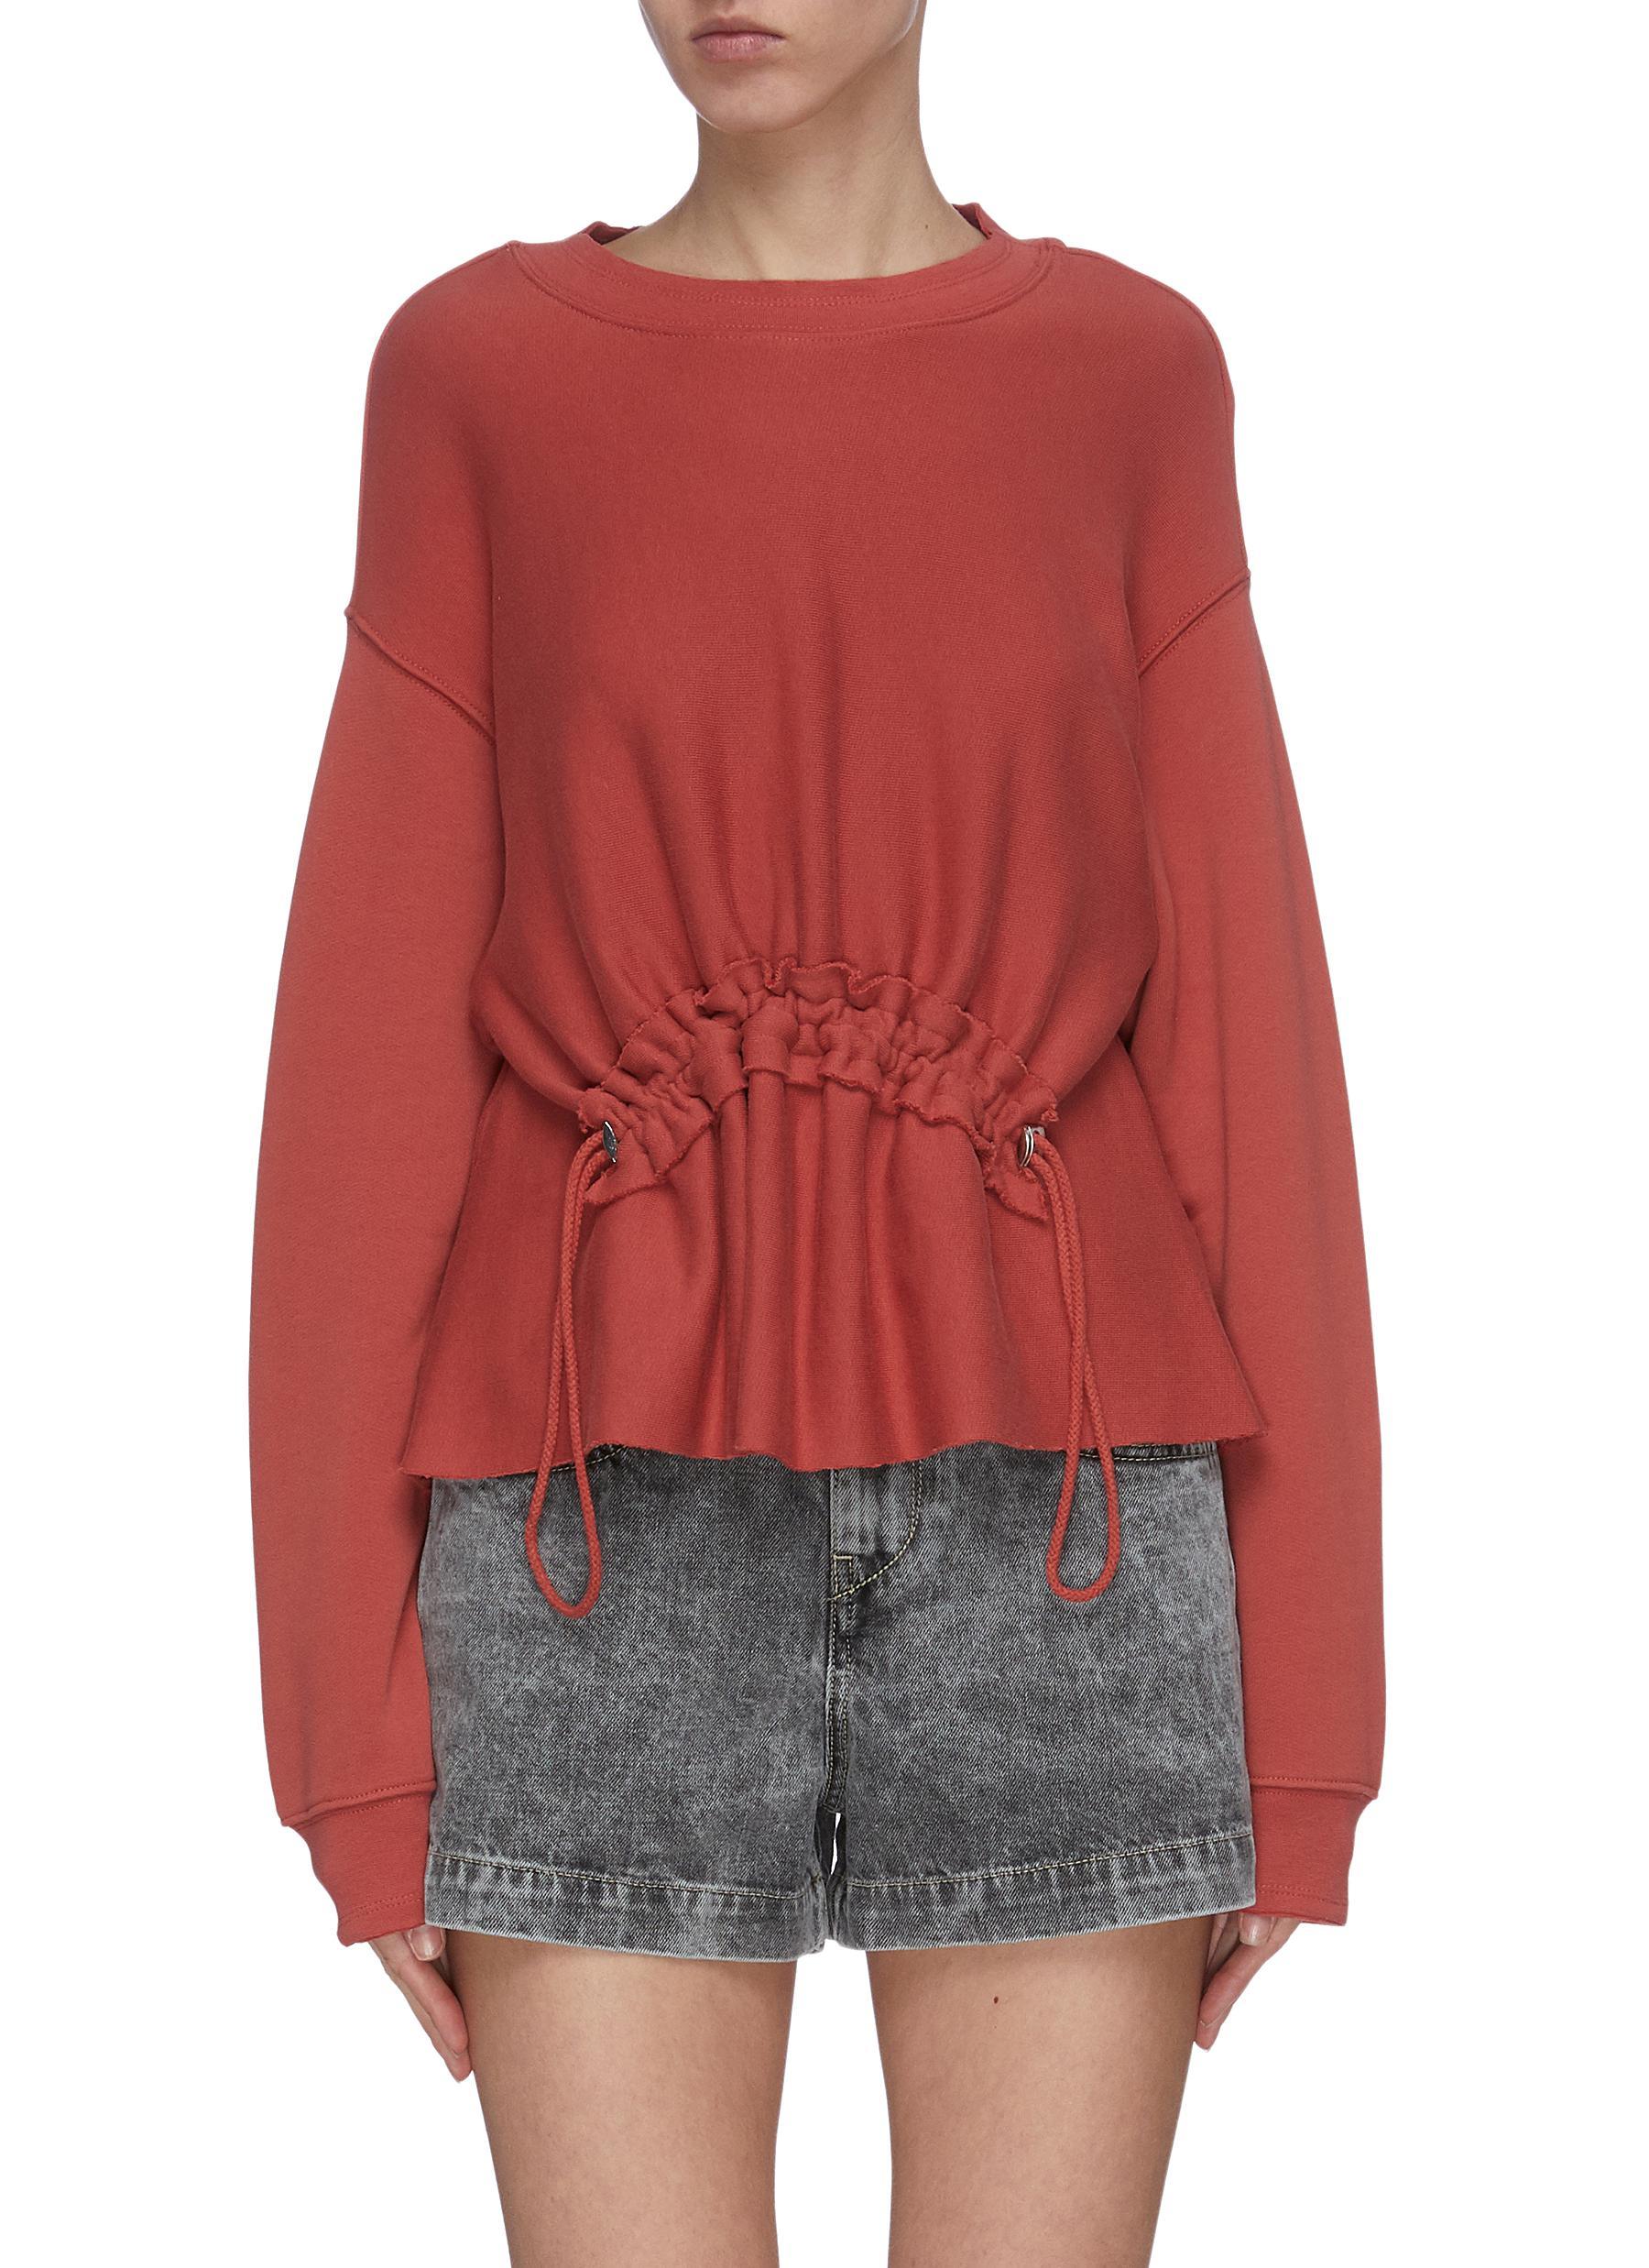 Buy Current/Elliott Tops 'Bloom' drawstring detail raglan sweatshirt